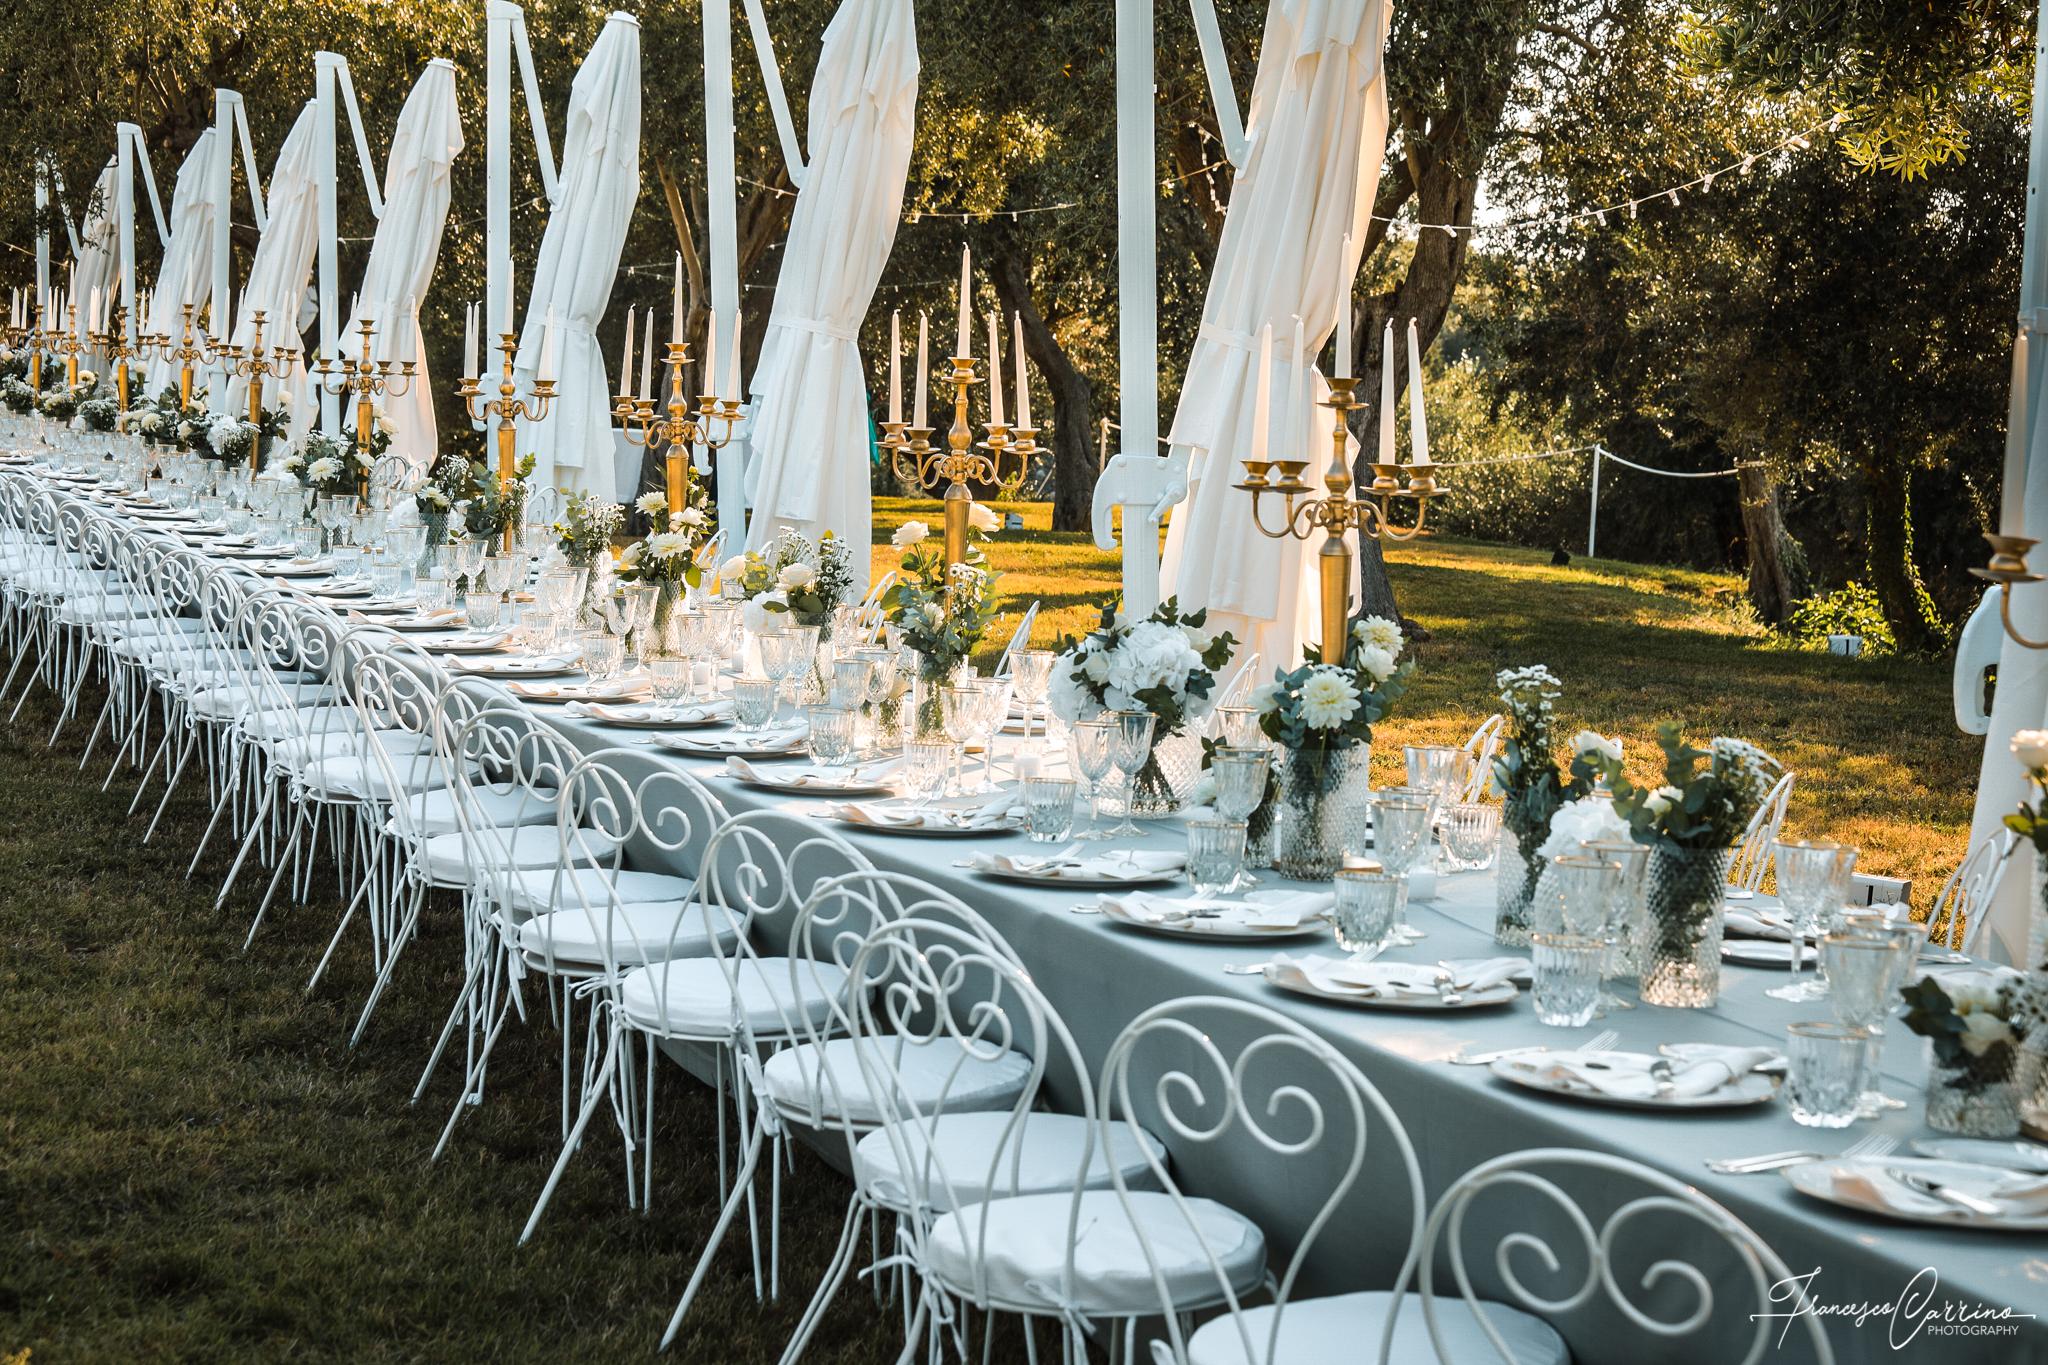 http://www.weddingamalfi.com/wp-content/uploads/Giannenza-13-luglio-2019-11.jpg